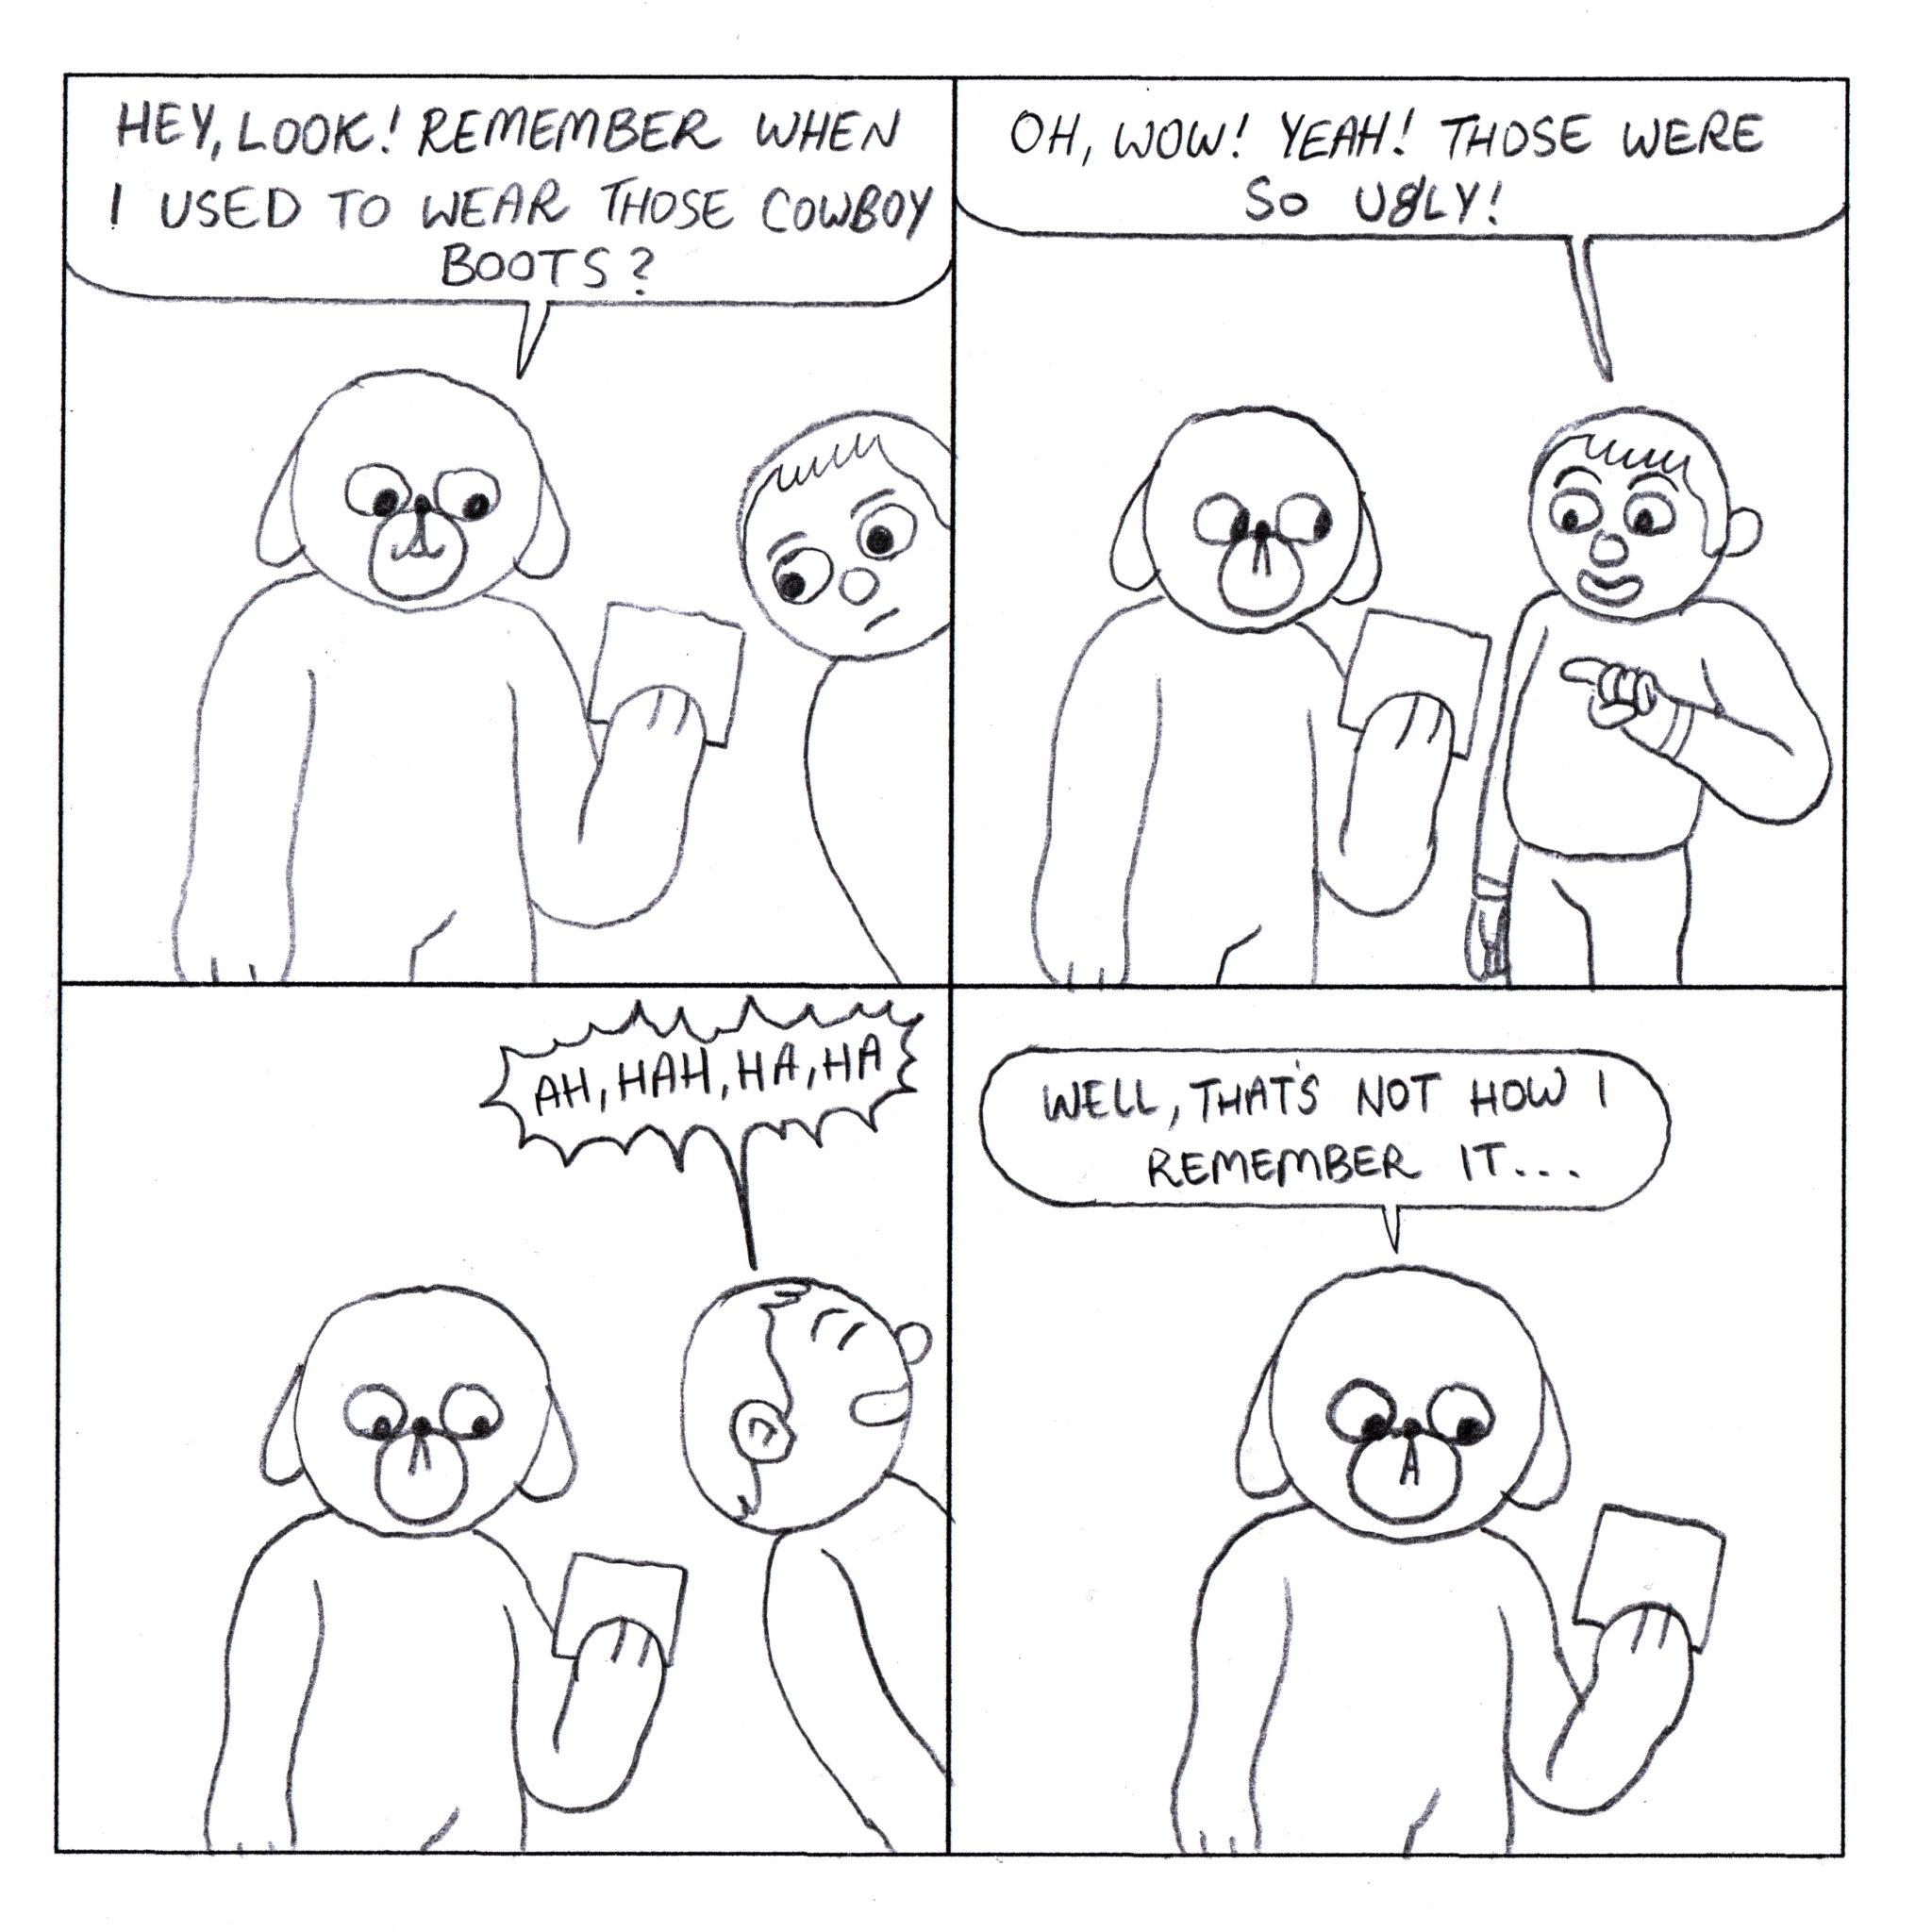 Dog Comics 171-175 - Page 1